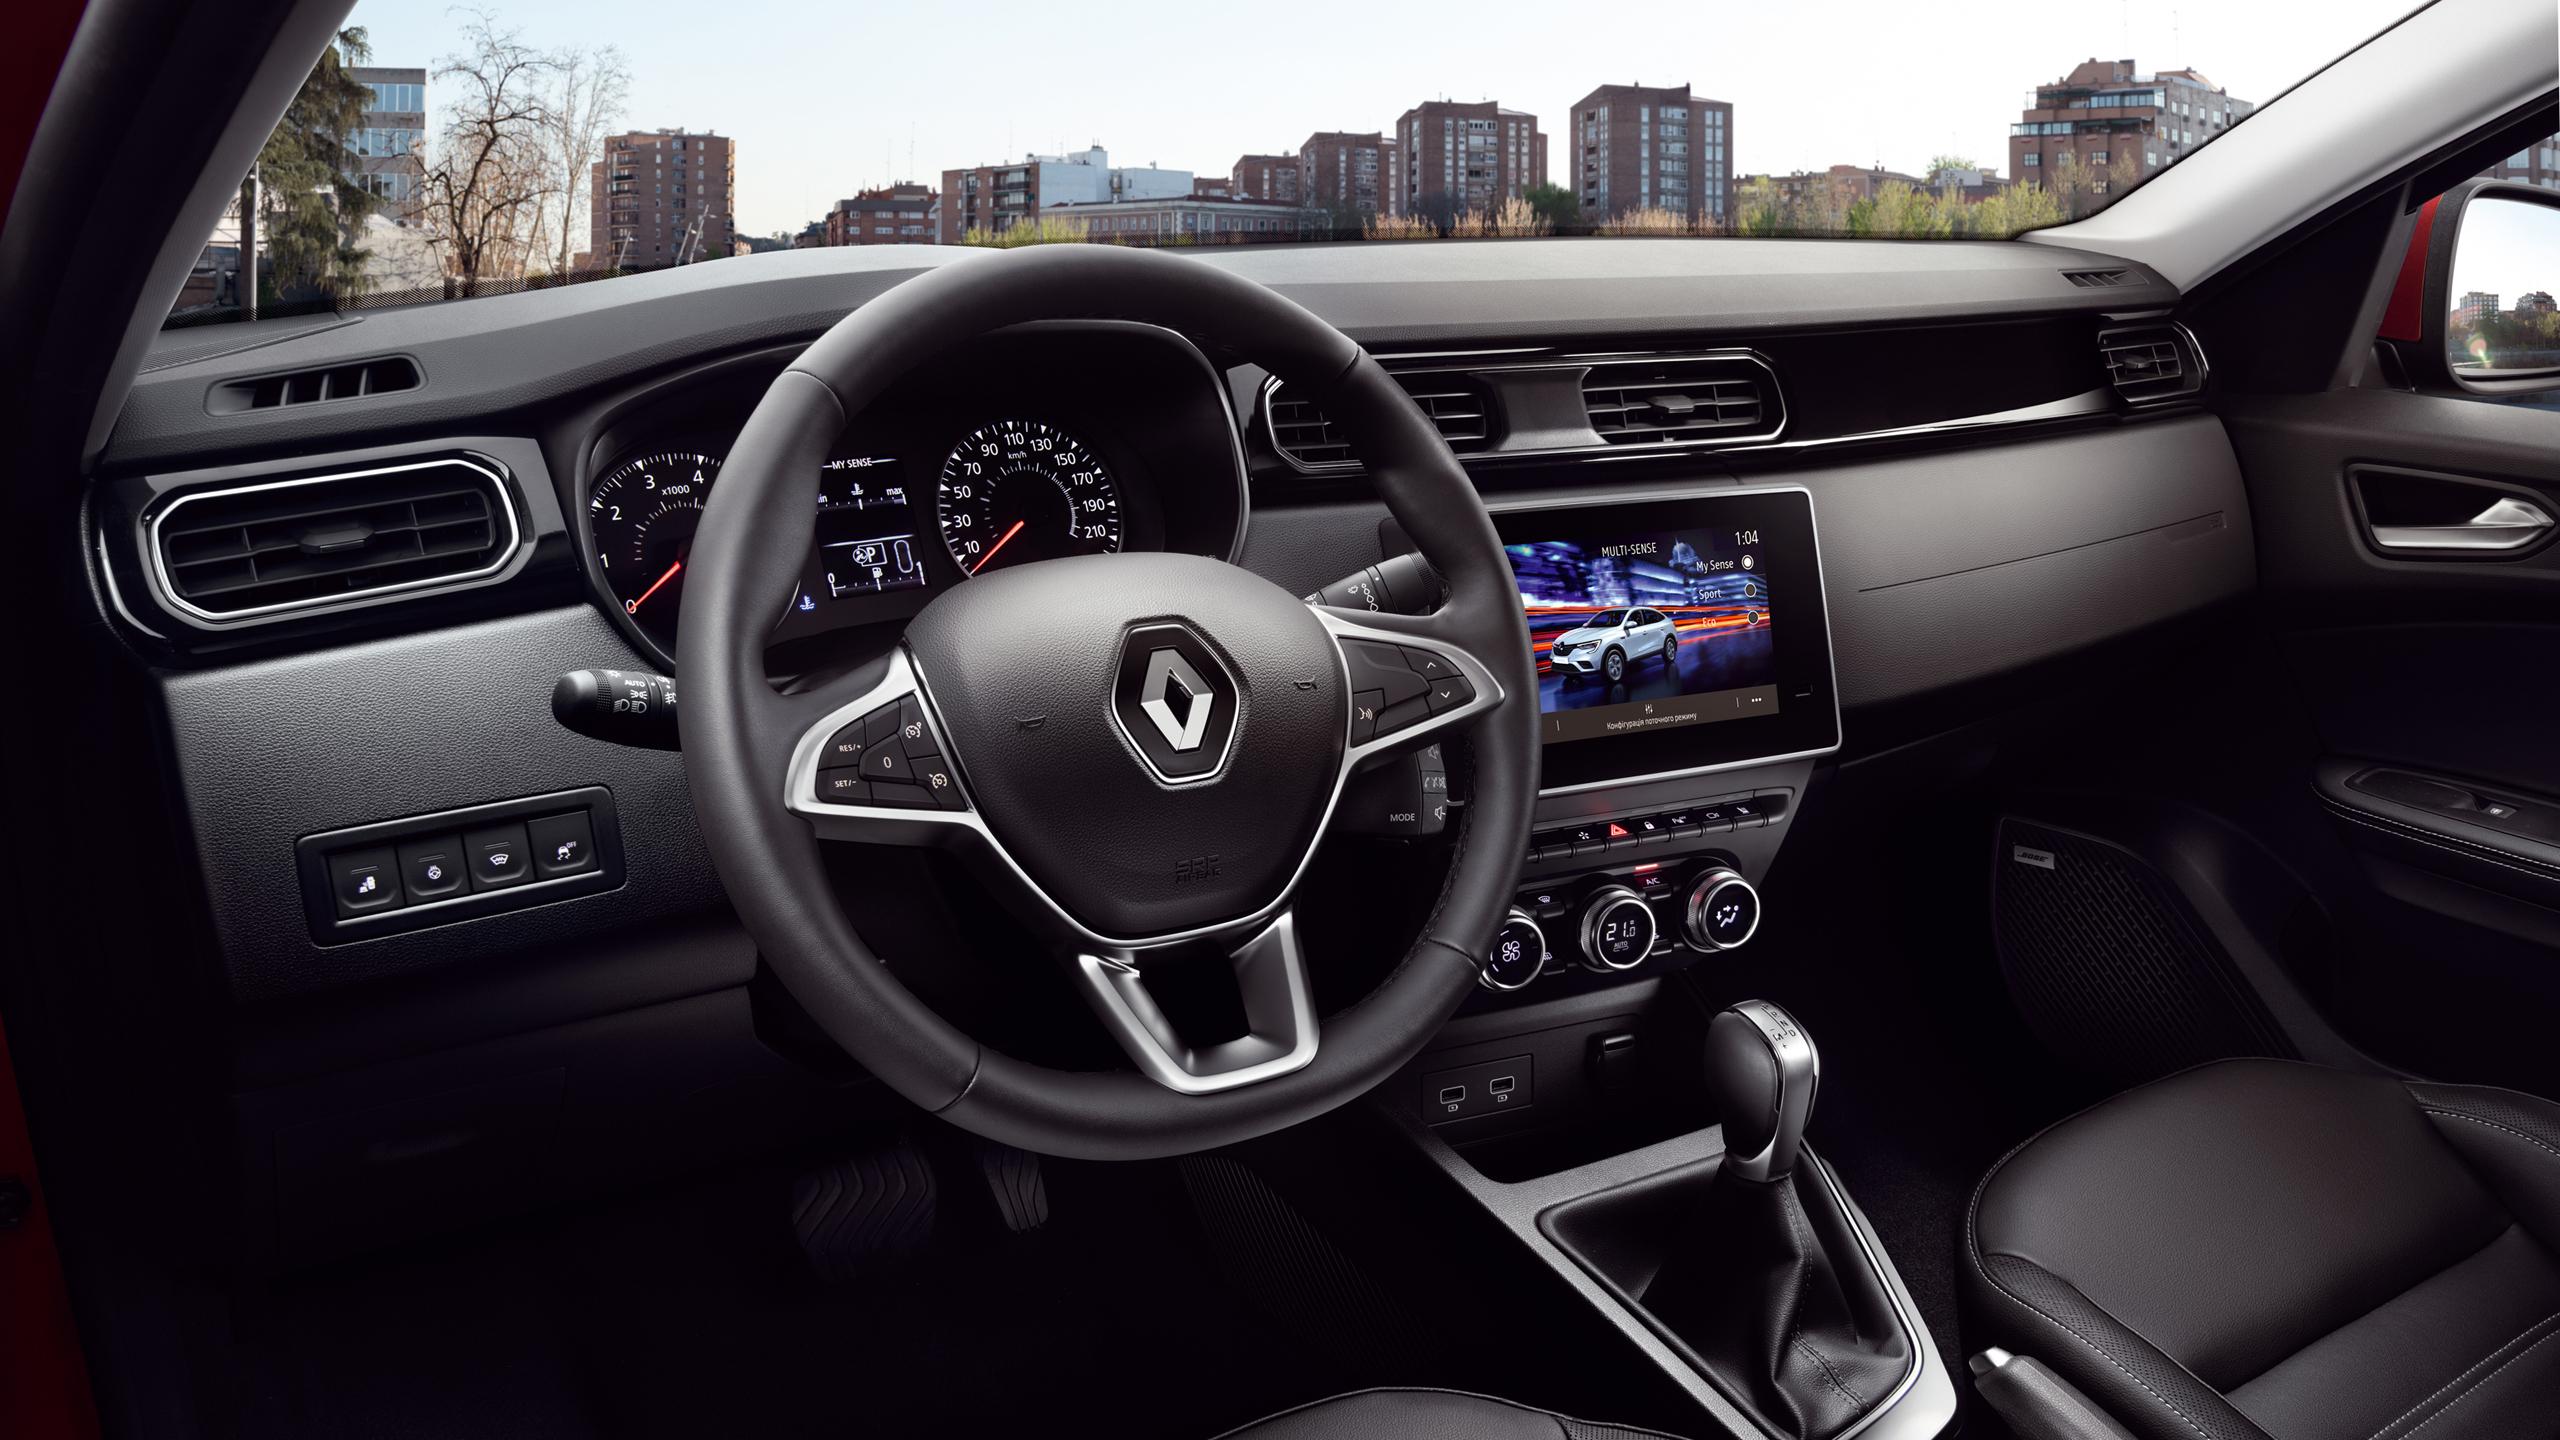 НОВИЙ Renault ARKANA  фото интерьера 6